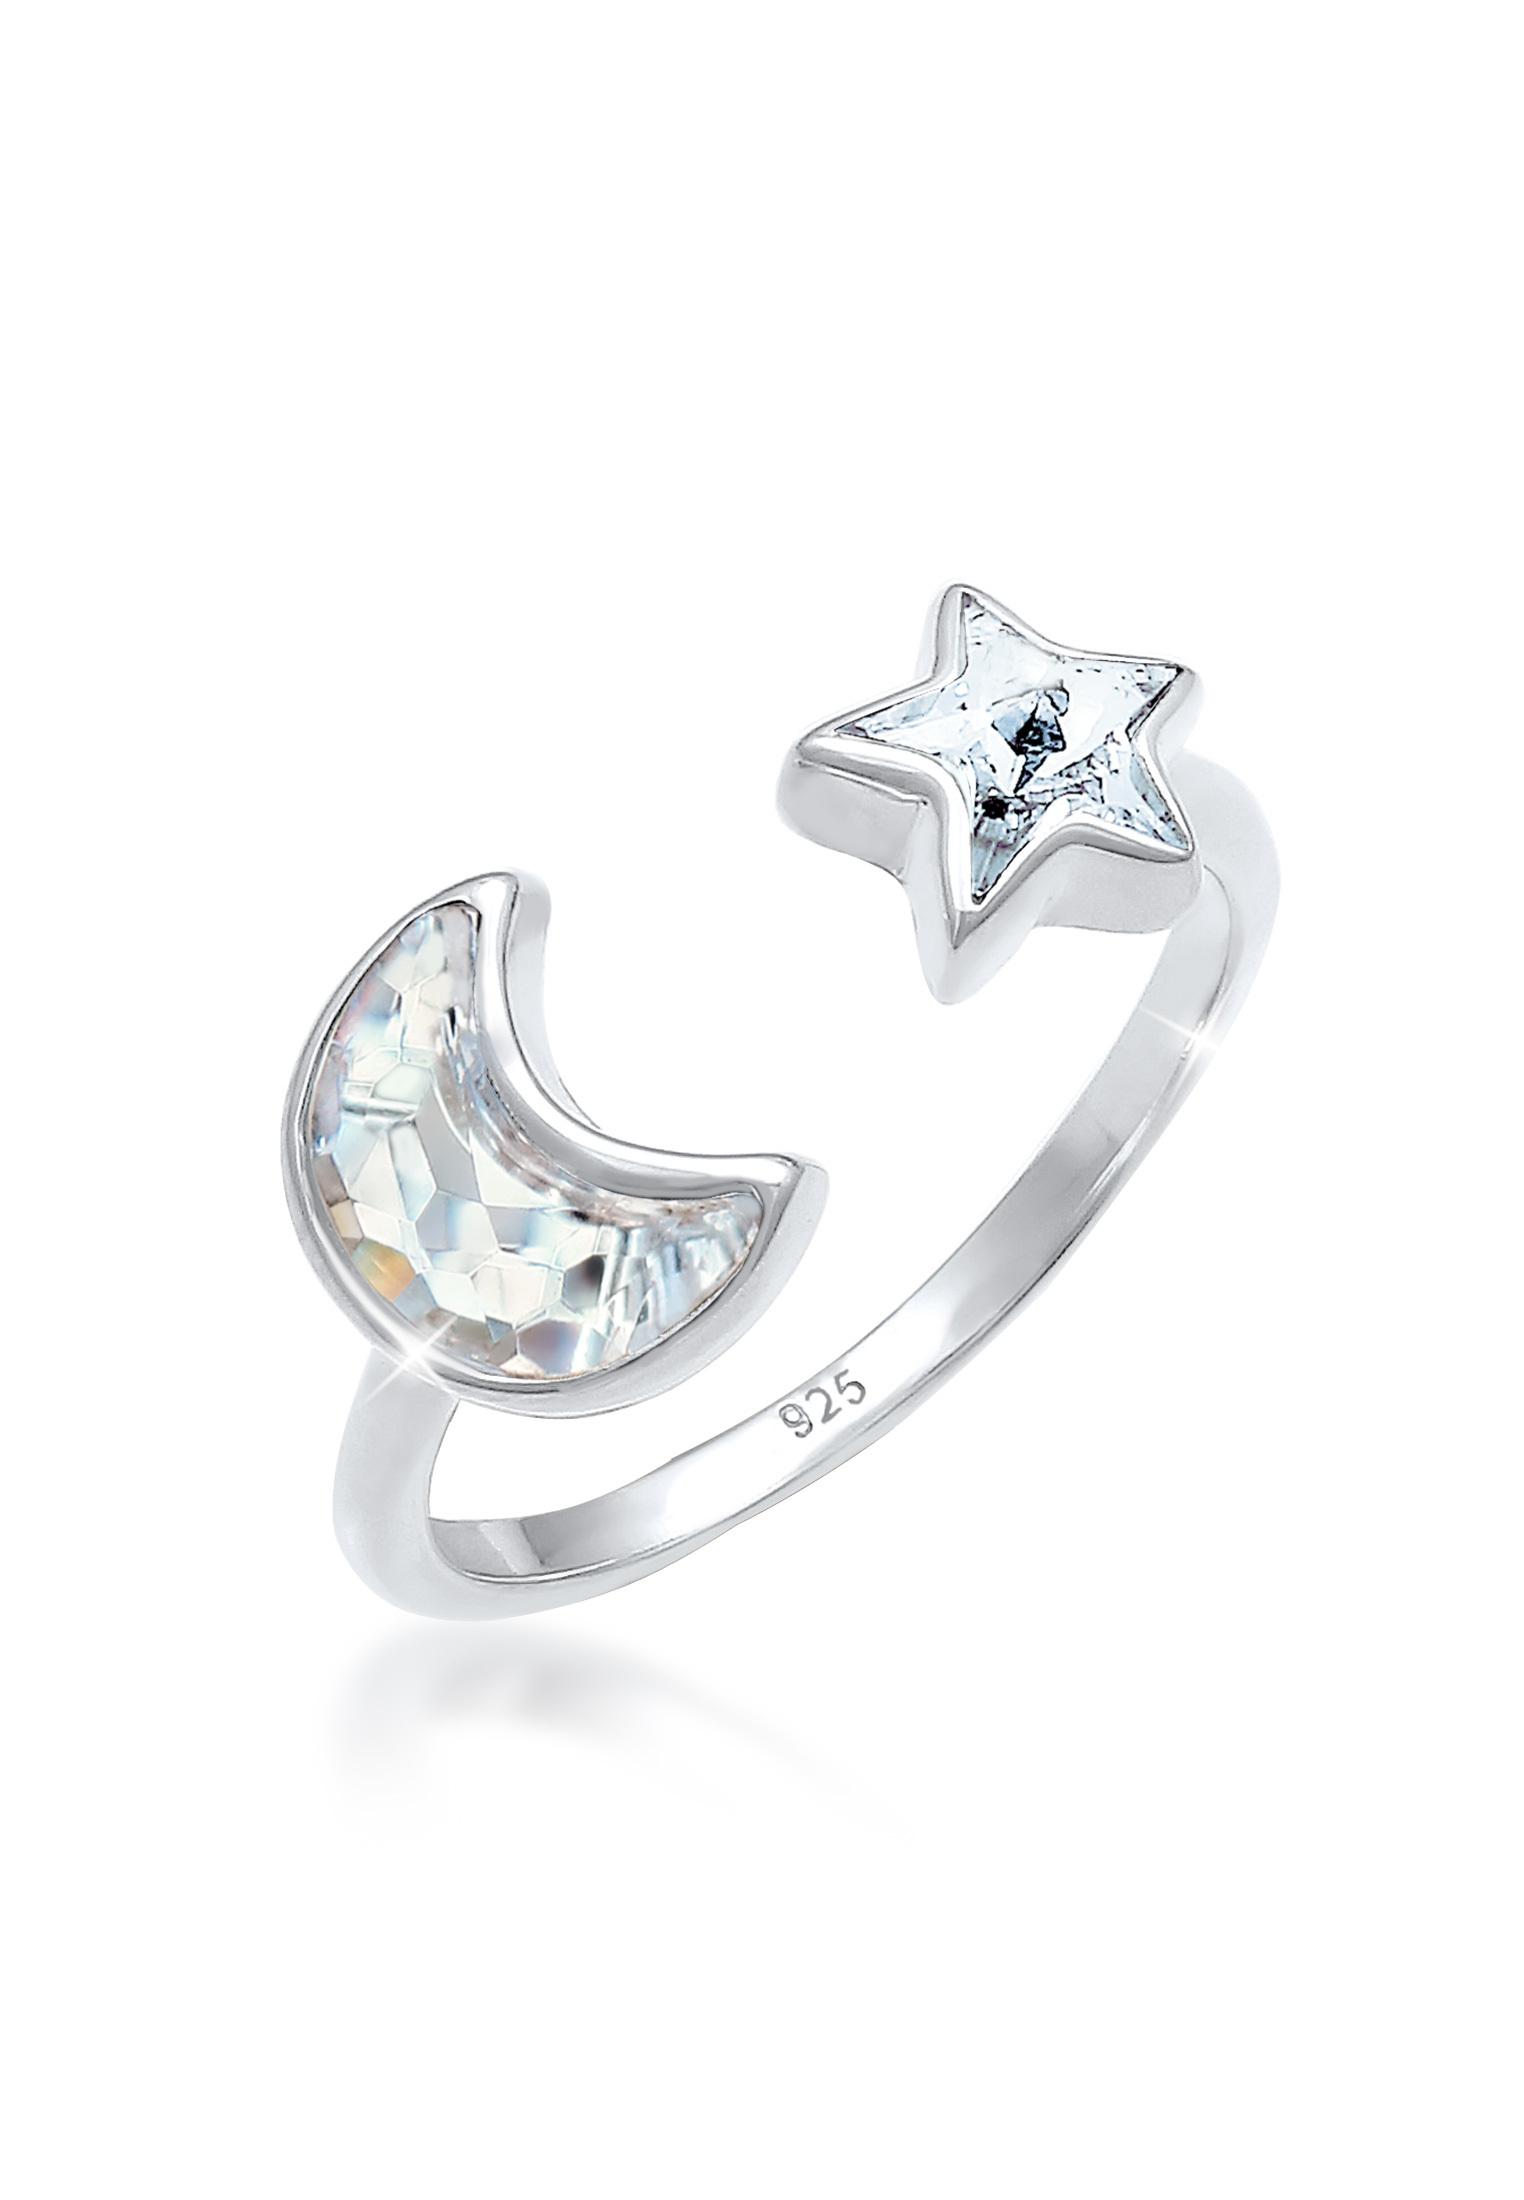 Ring Halbmond | Kristall ( Weiß ) | 925er Sterling Silber